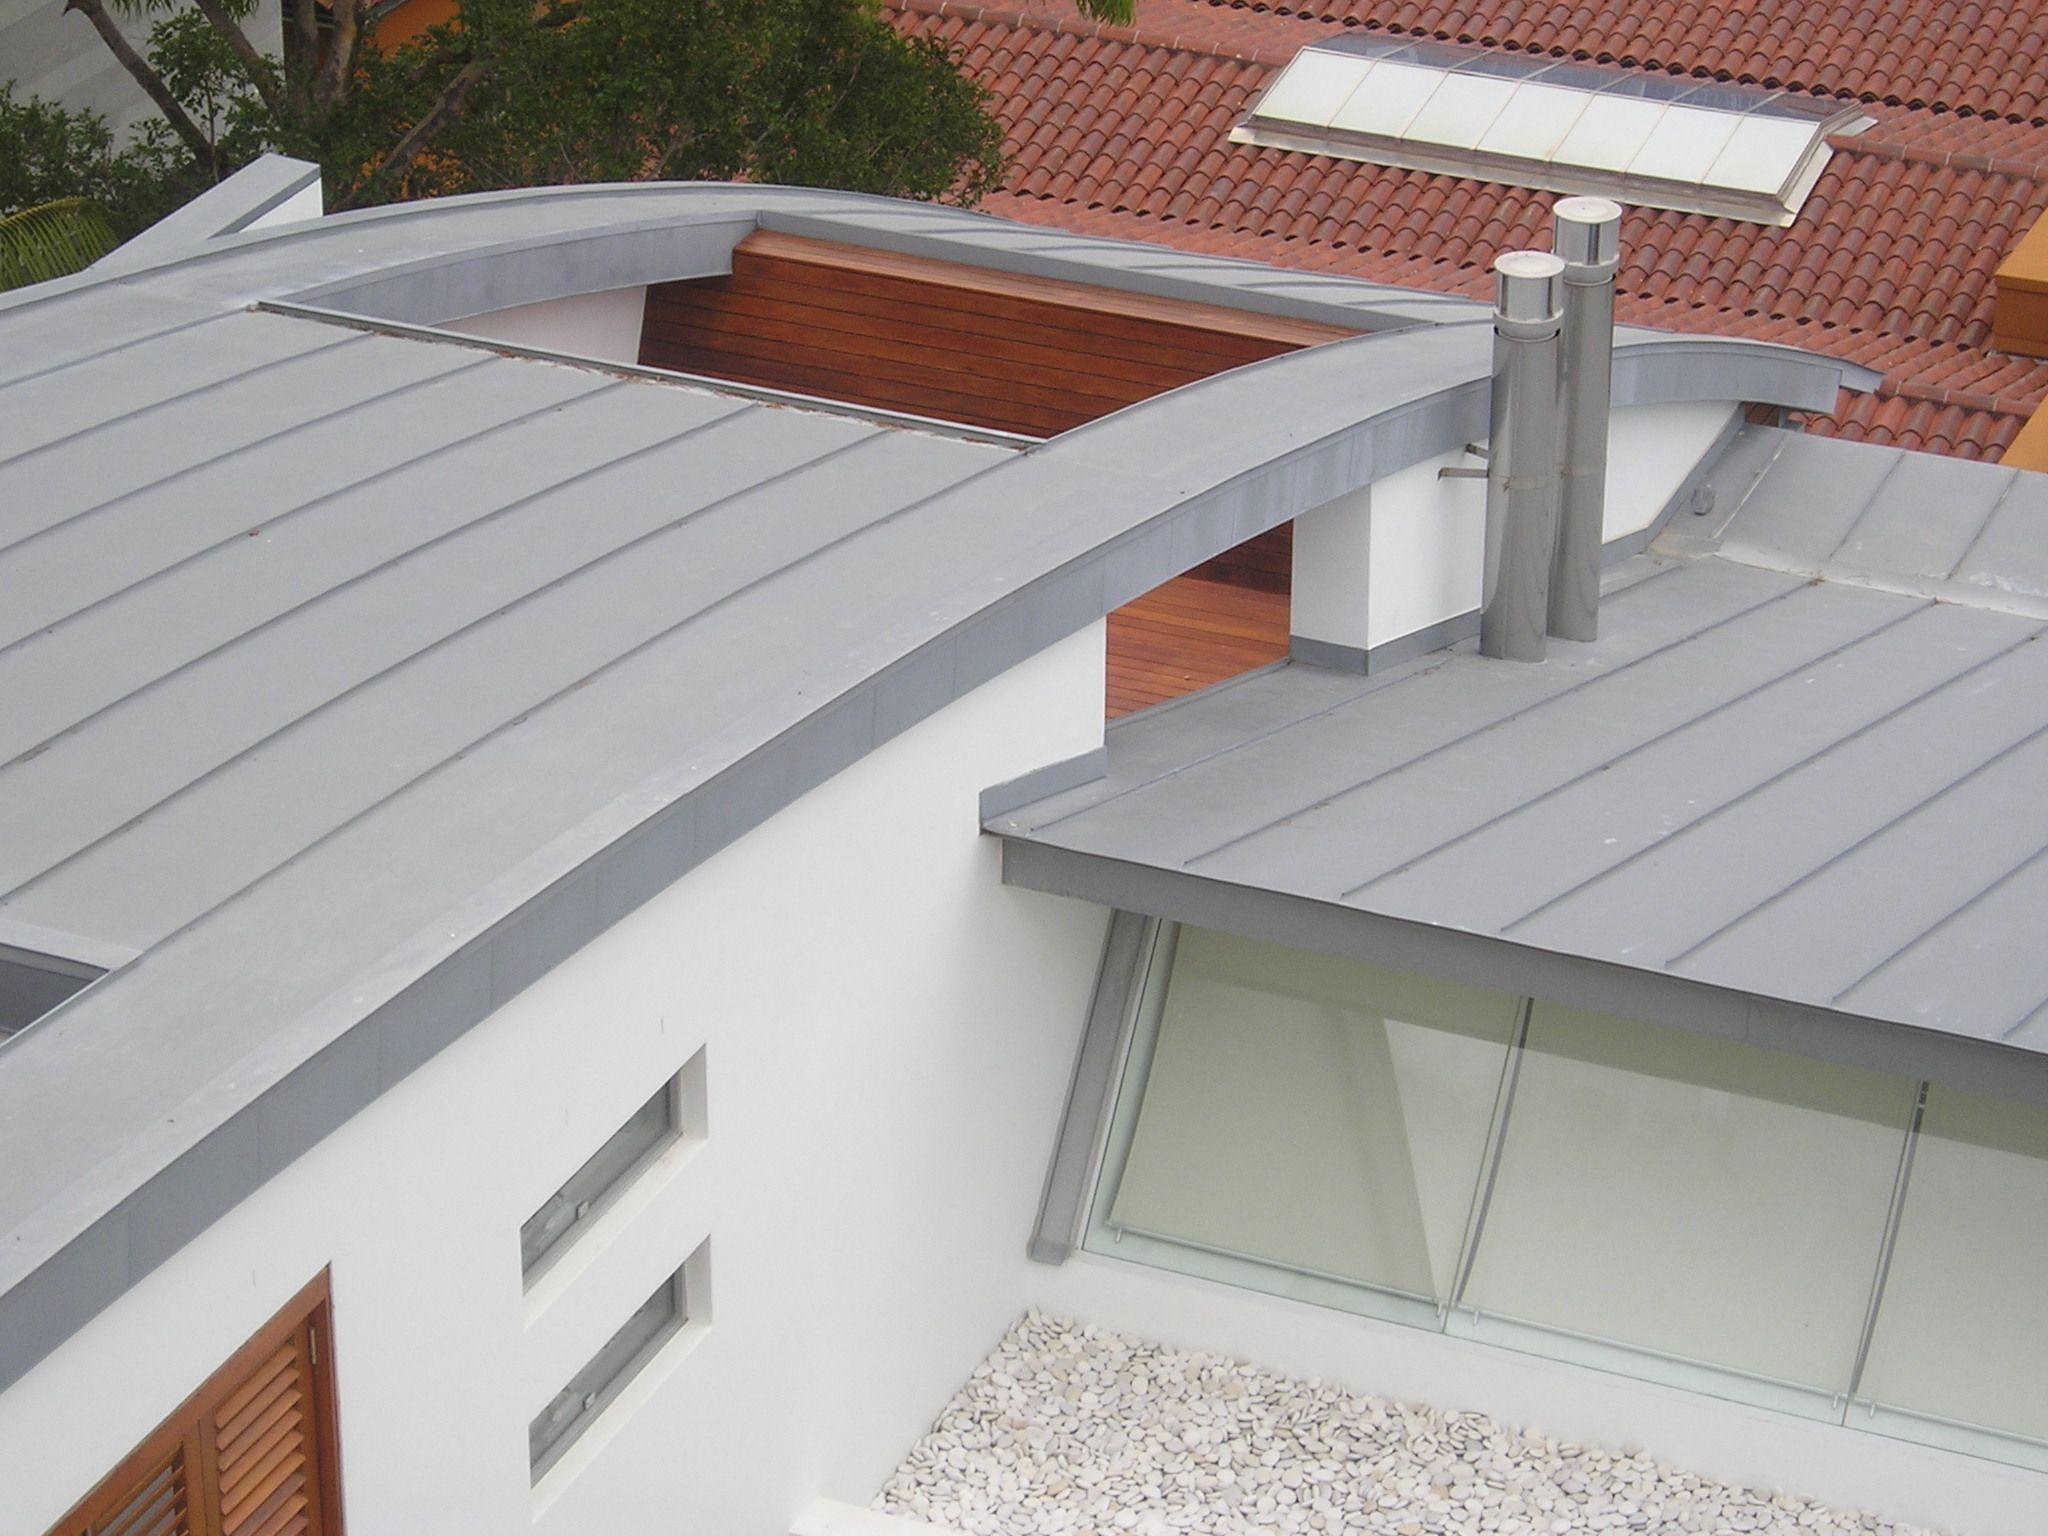 Jaa Studios Vaucluse Residence Sydney Clad In Rheinzink Pre Weathered Titanium Zinc Double Standing Seam And H25 Panels Zinc Roof Standing Seam Cob House